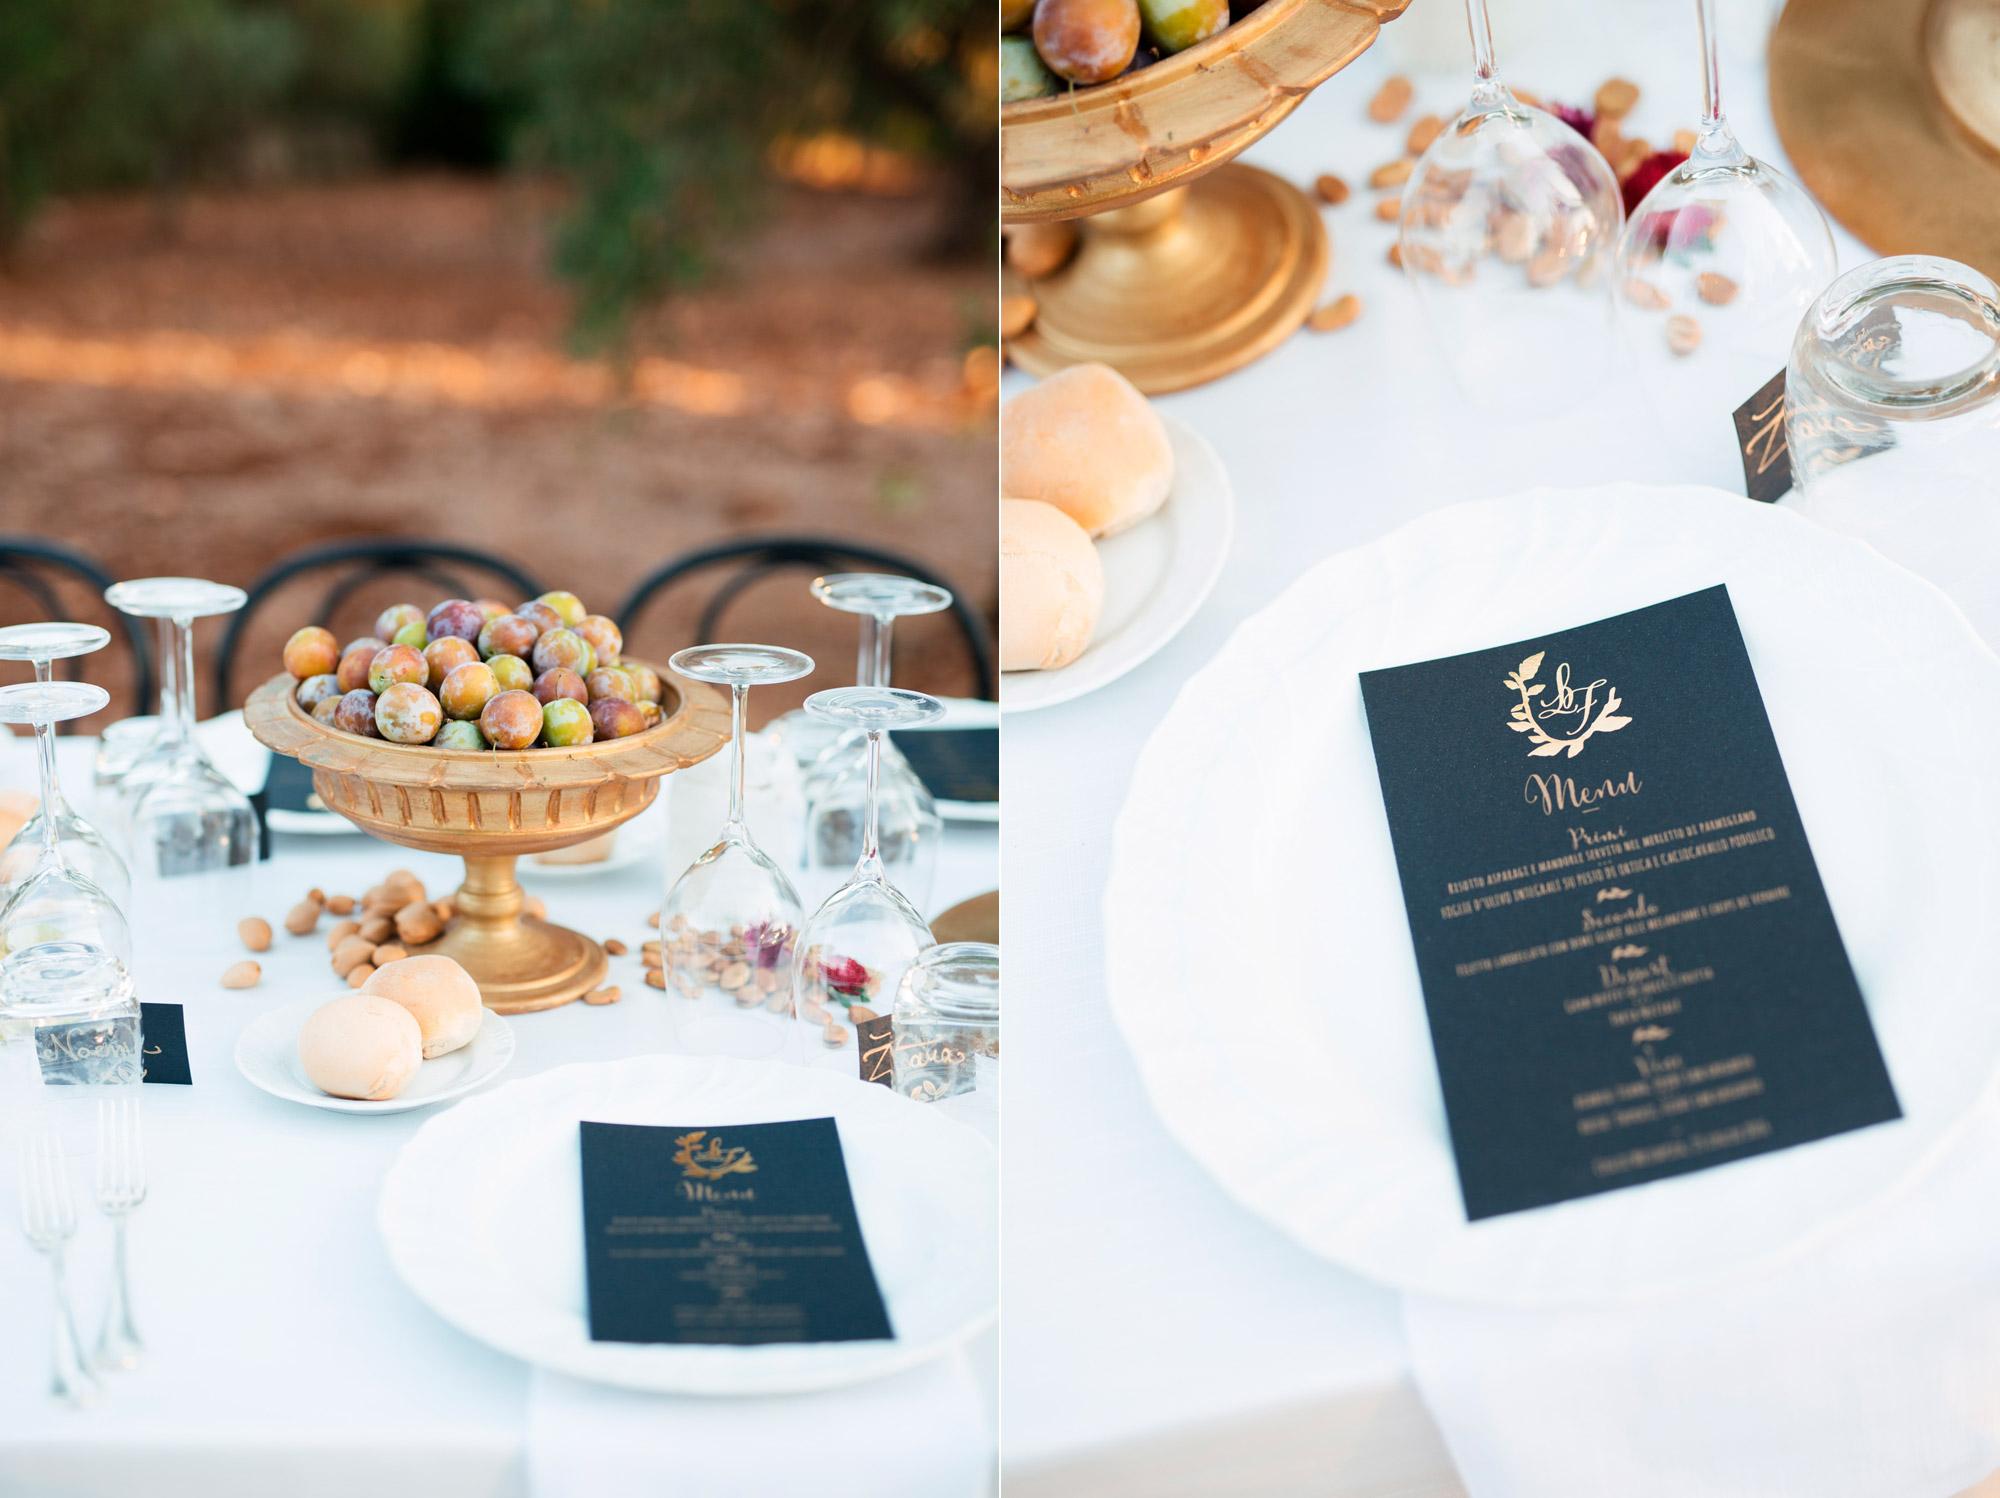 202-FIKUS-PUGLIA-wedding-ostuni-masseria.jpg